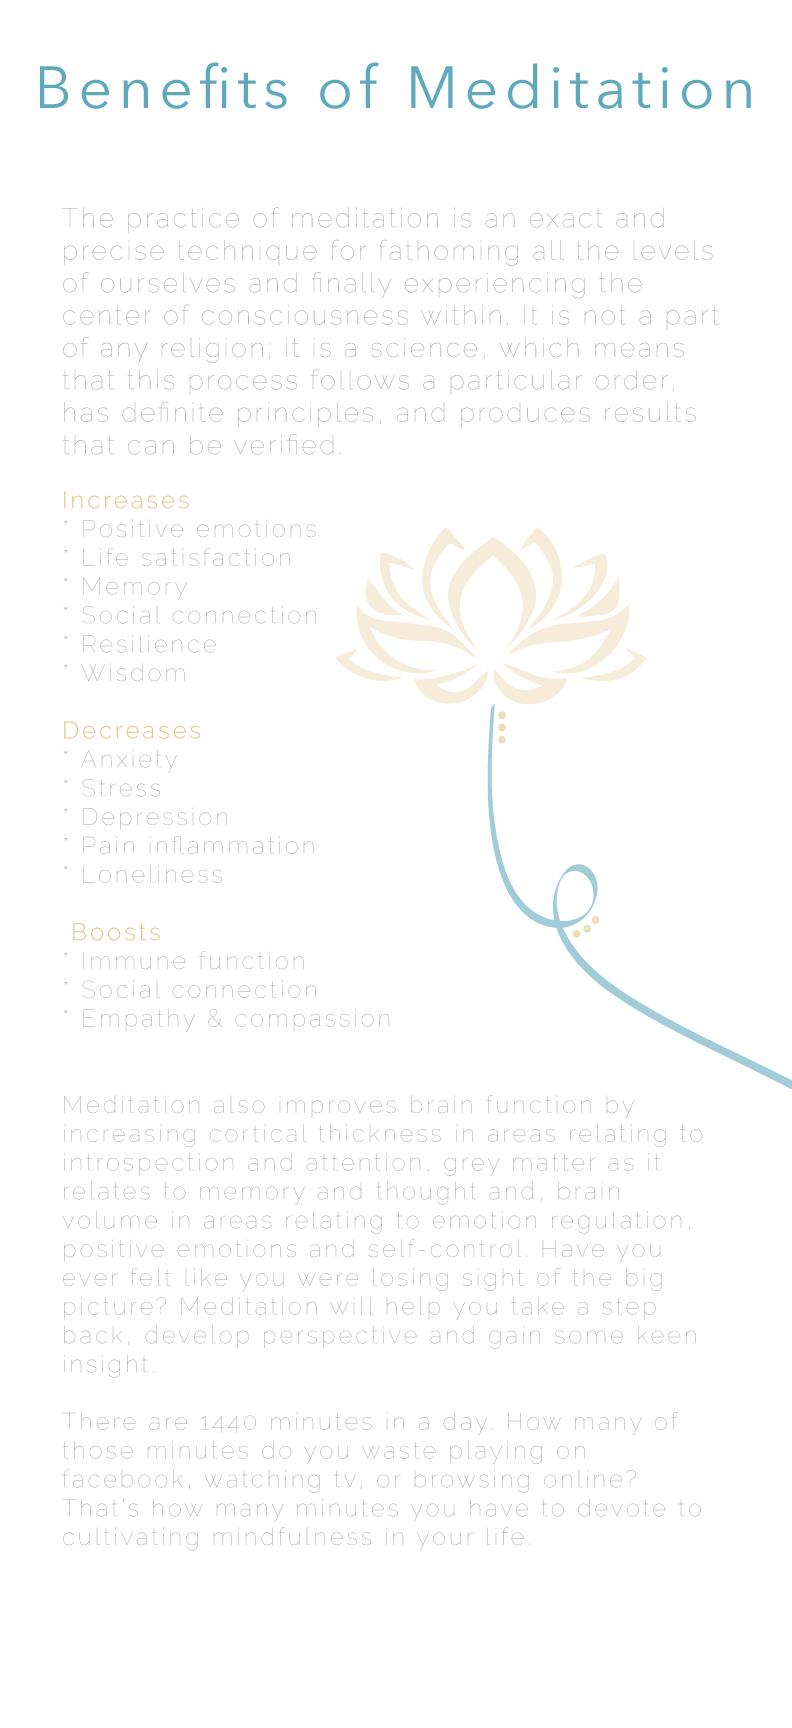 benefits-of-meditation-.jpg